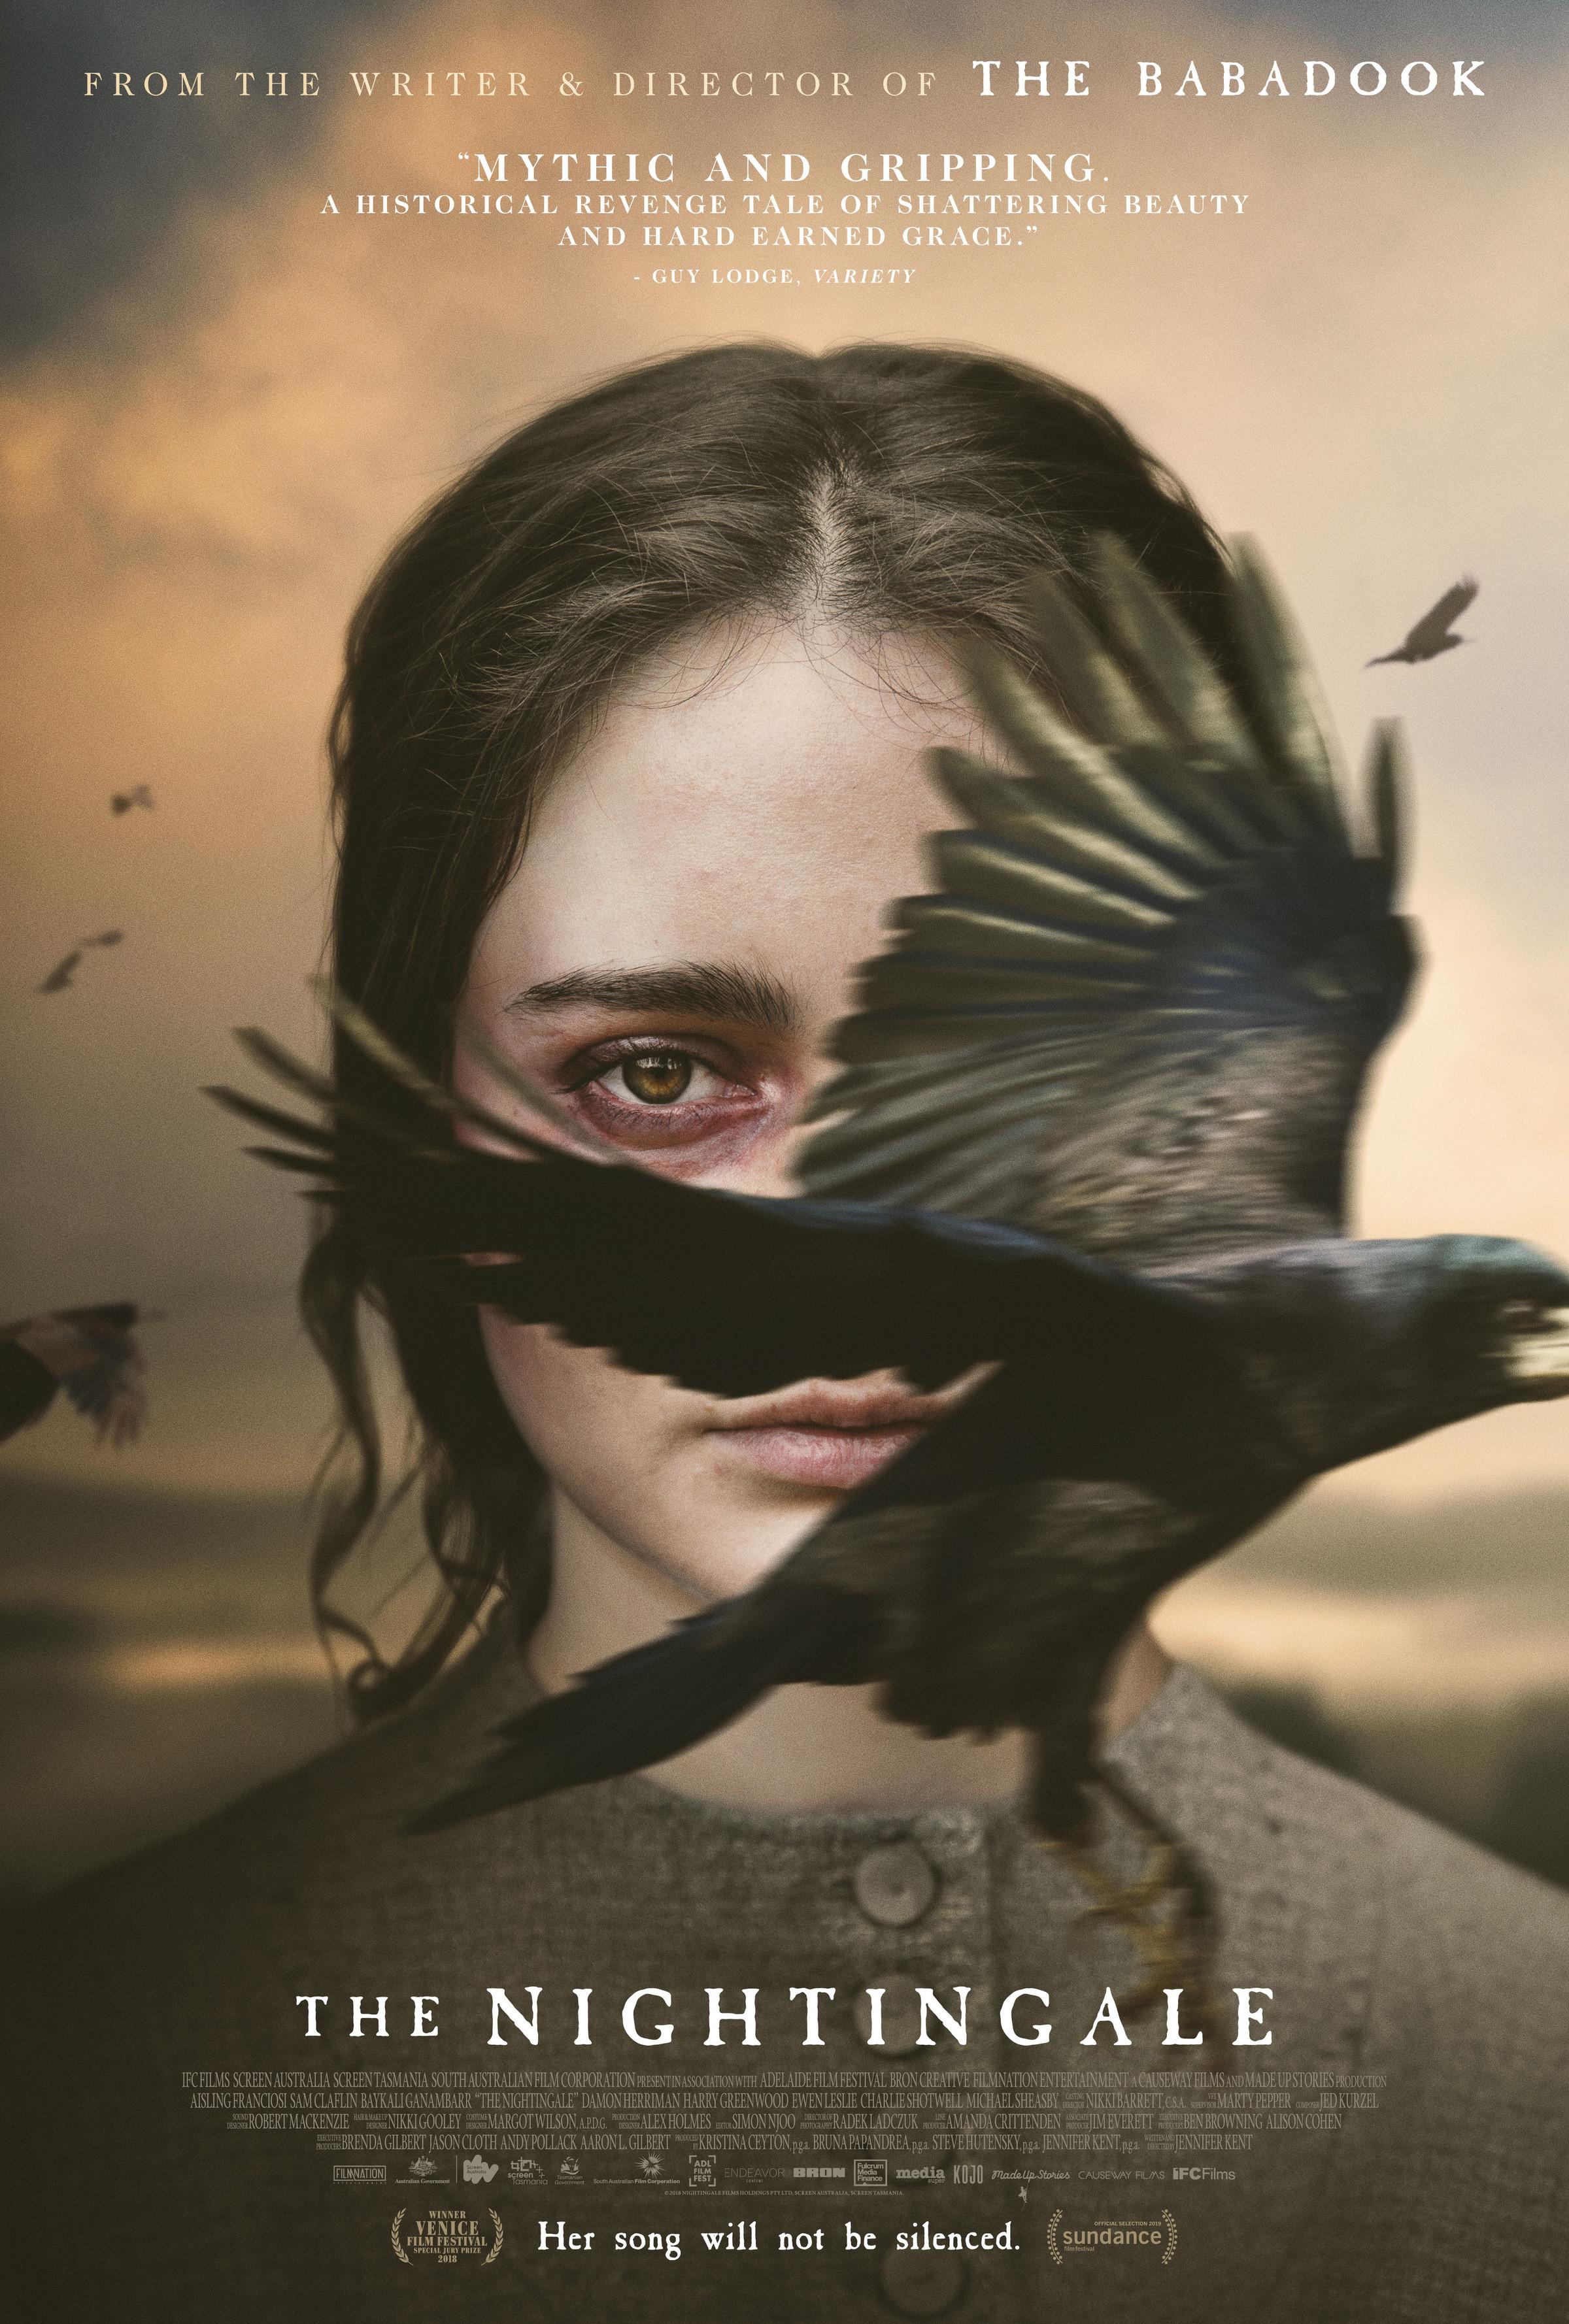 The Nightingale (2019) Reviews - Metacritic